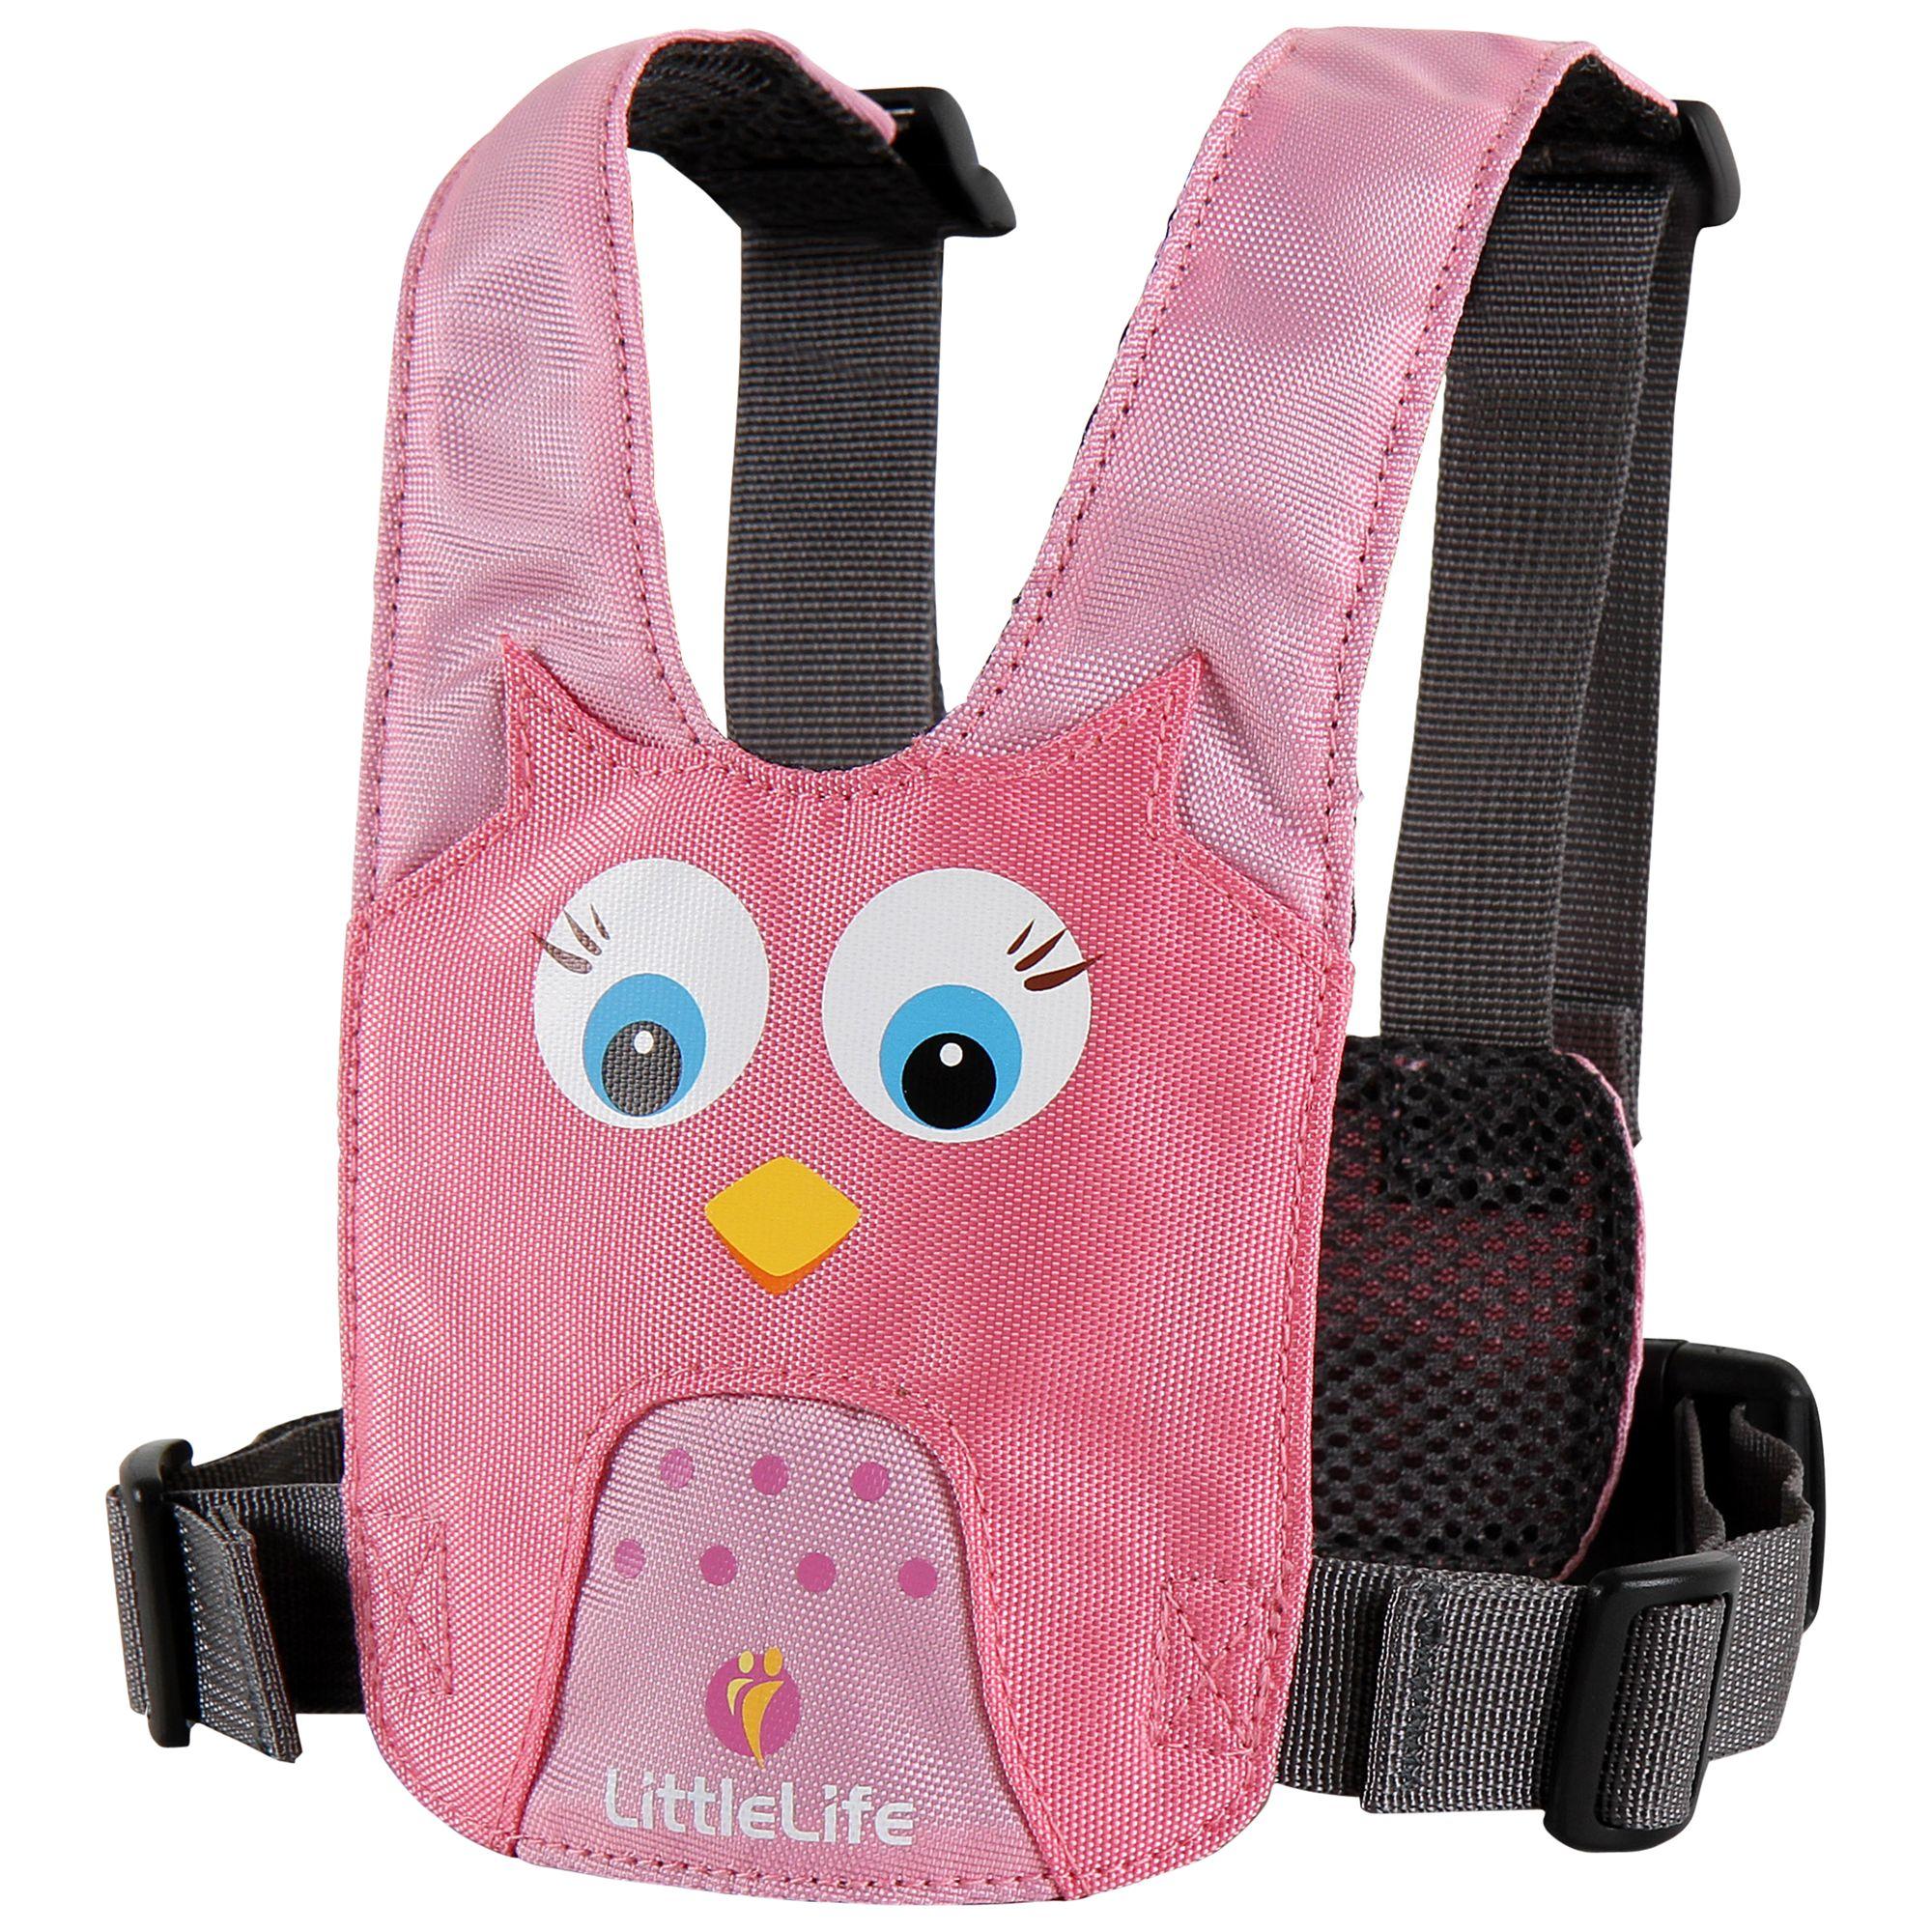 Littlelife LittleLife Owl Animal Harness, Pink